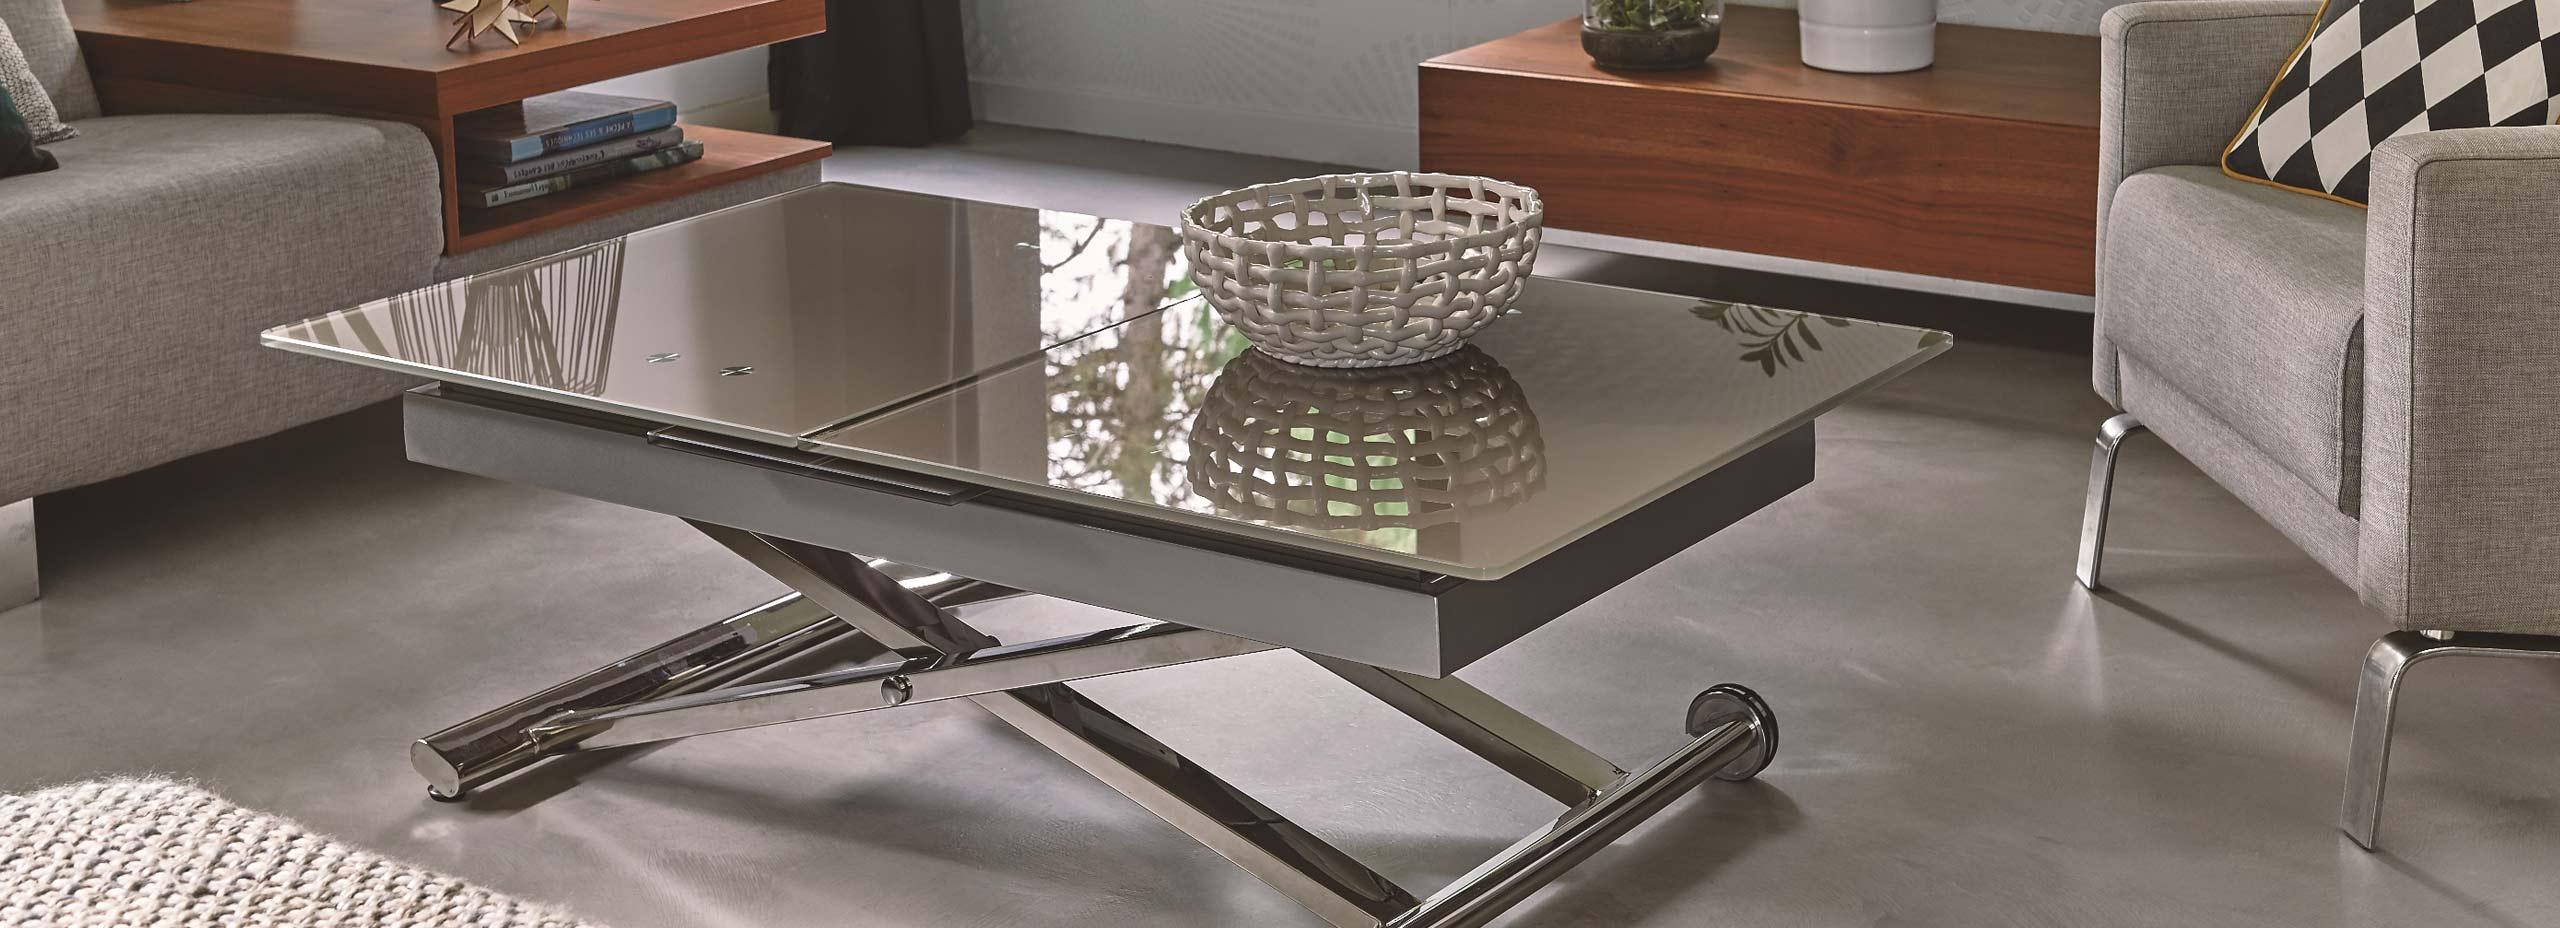 Basses Mb Vendée Concept Salon Tables Challans 85 TlJuFc135K